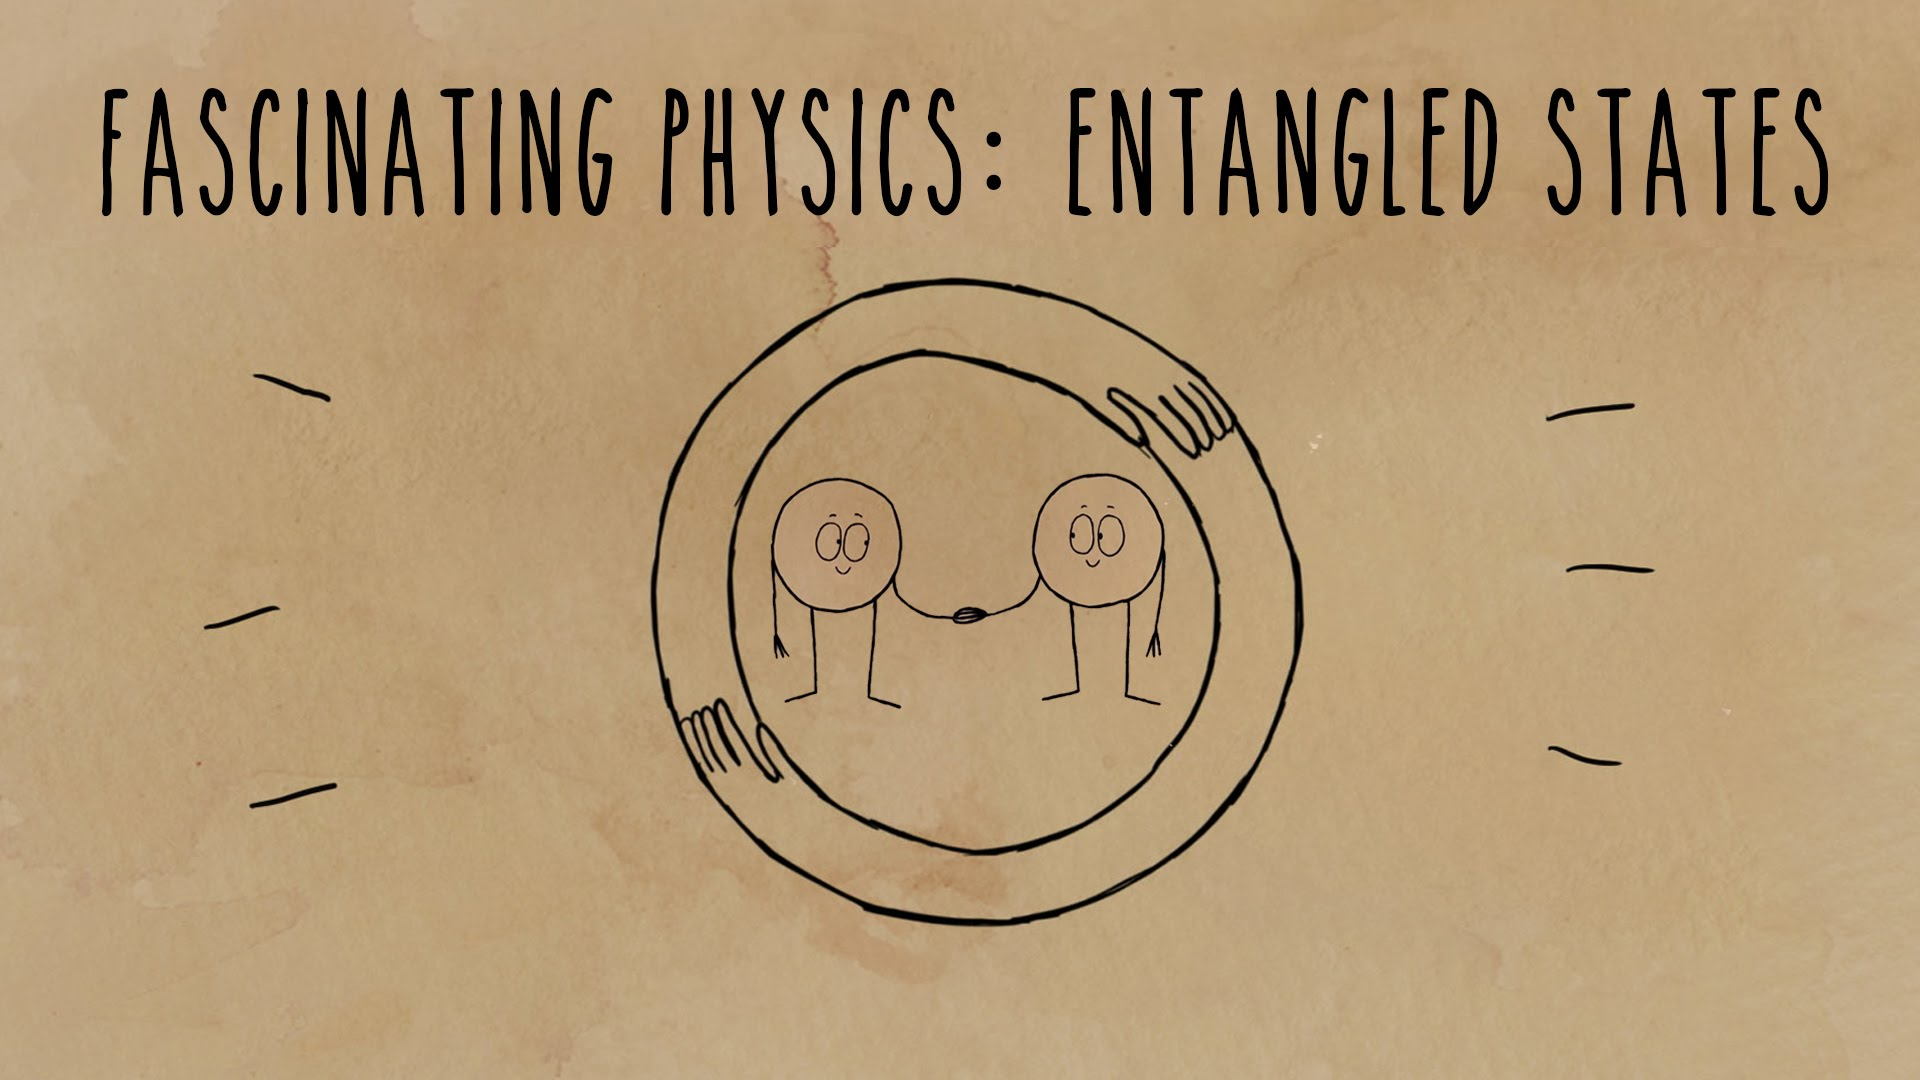 Einstein's brilliant mistake: Entangled states